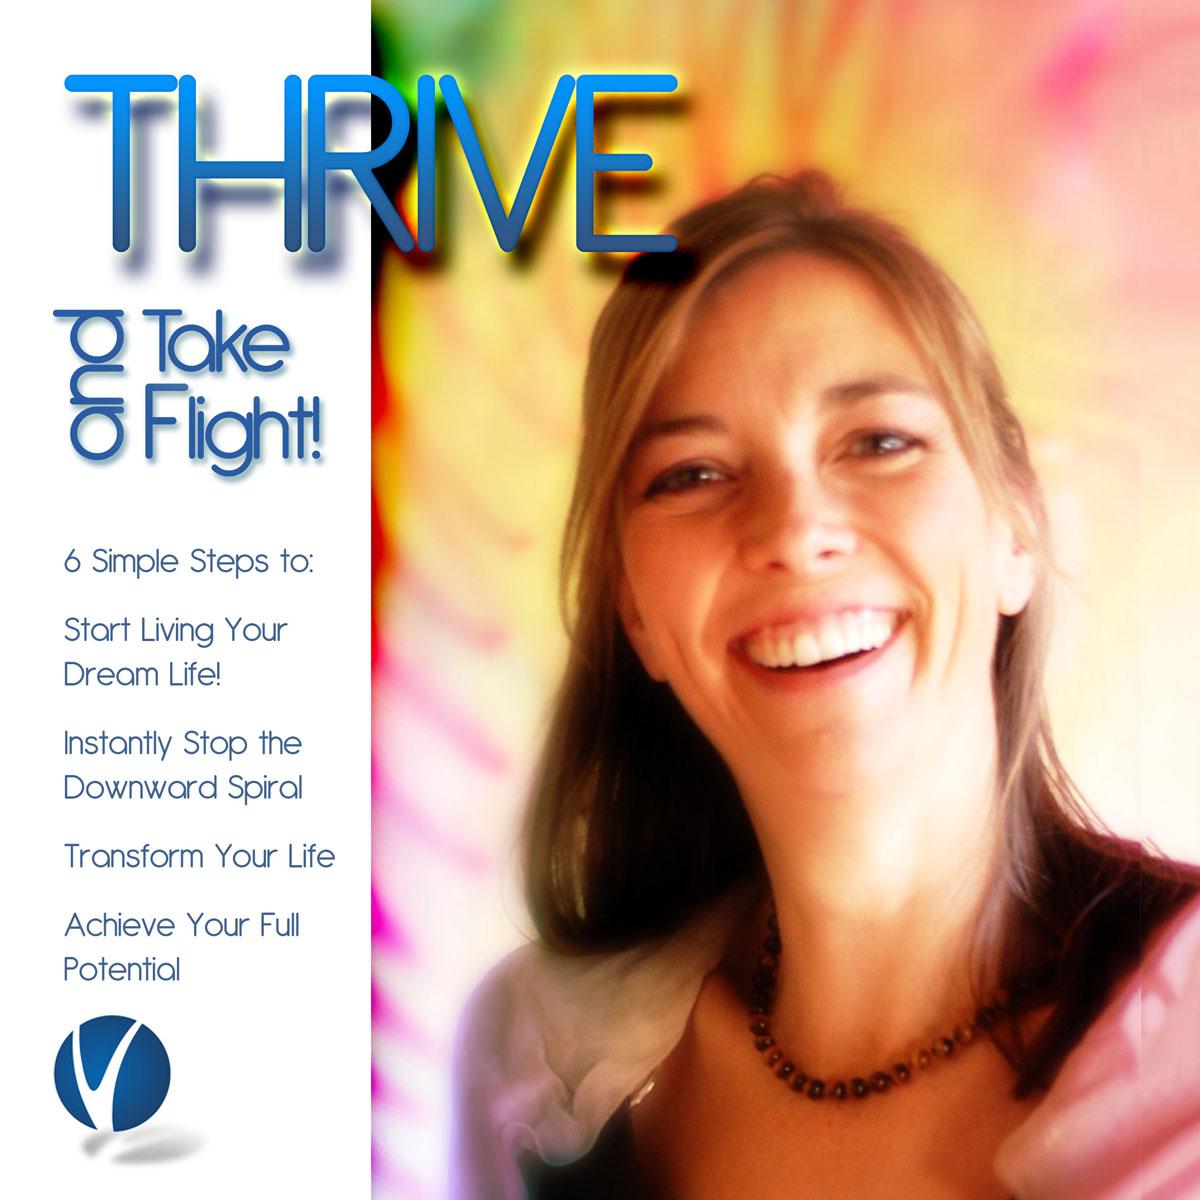 deep-gratitude-karen-volo-thrive-take-flight-1200x1200